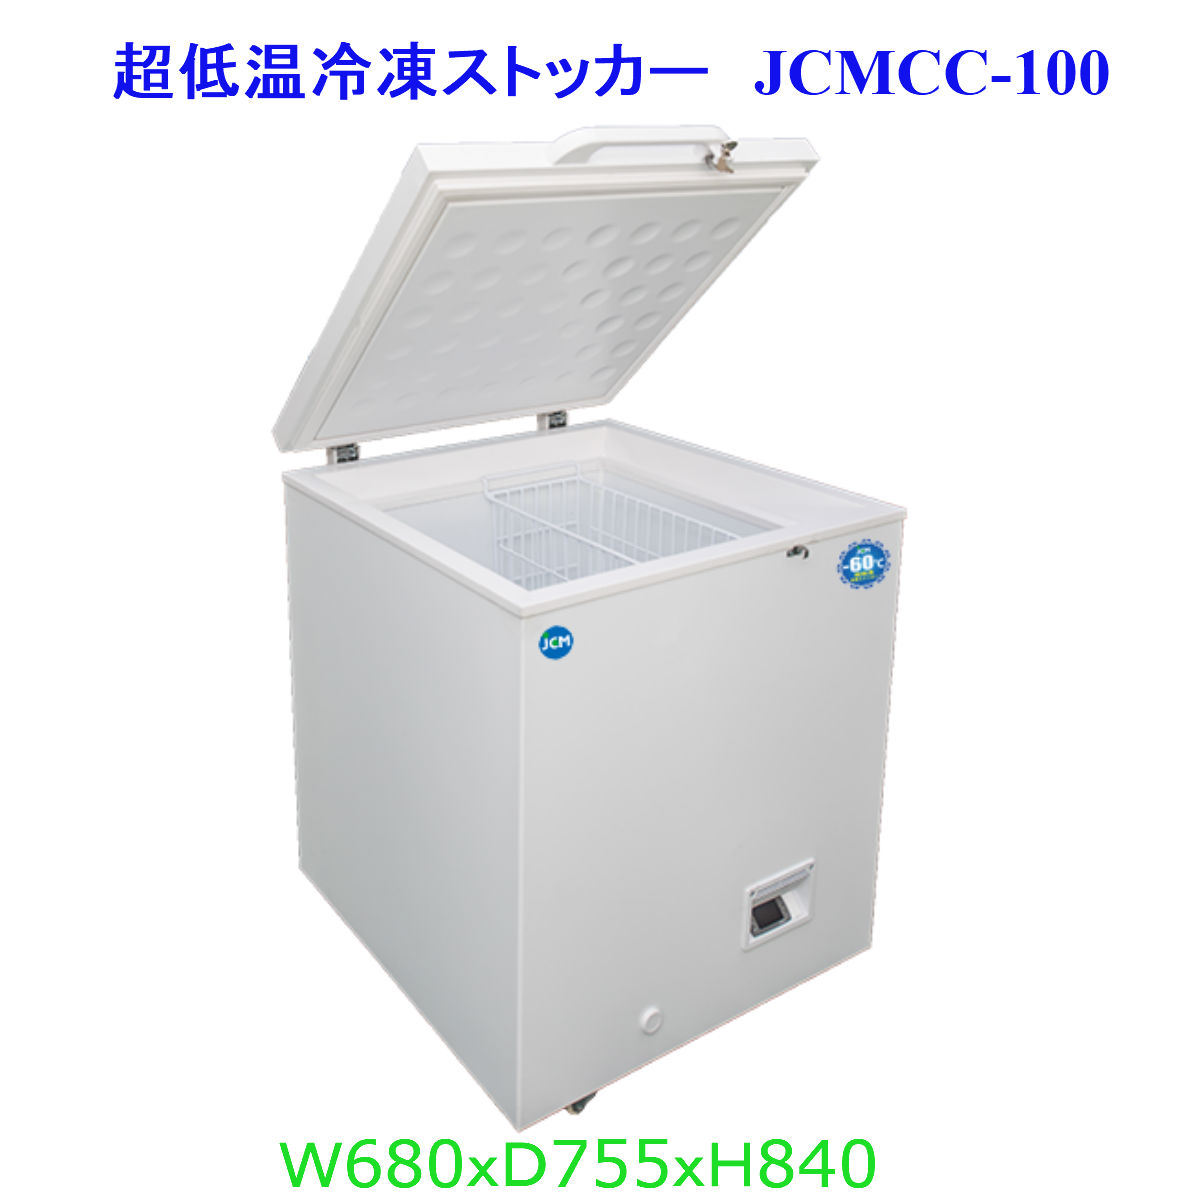 送料無料 新品 JCM 超低温 冷凍ストッカー 実物 JCMCC-100 5☆好評 業務用 104L 上開き 冷凍庫 -60℃